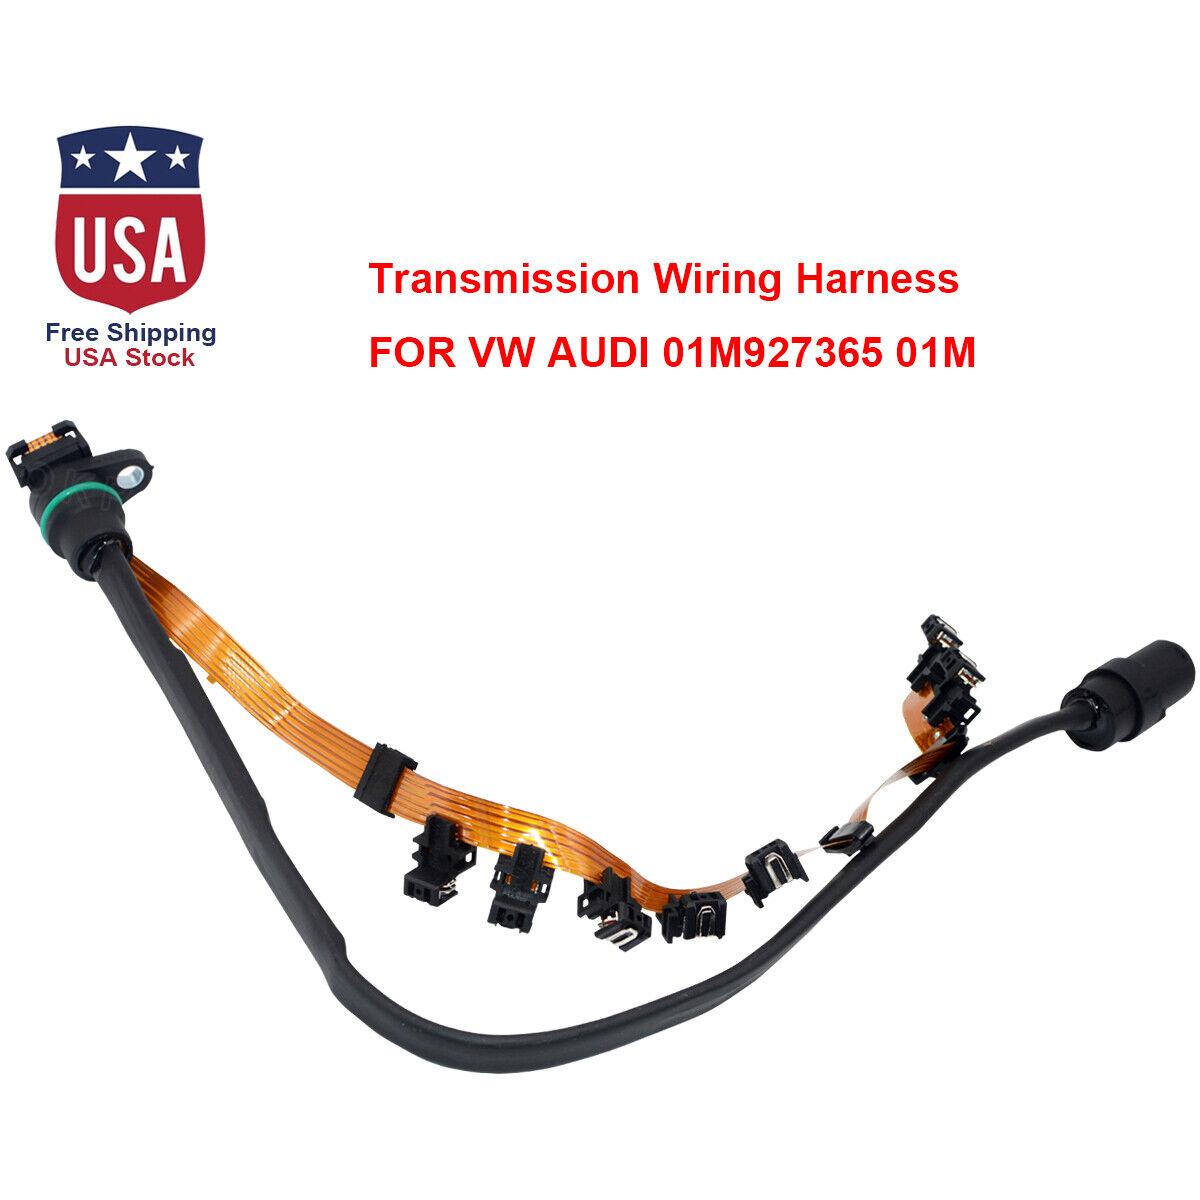 095 096 097 01M Transmission Valve Body Internal Wiring Harness For